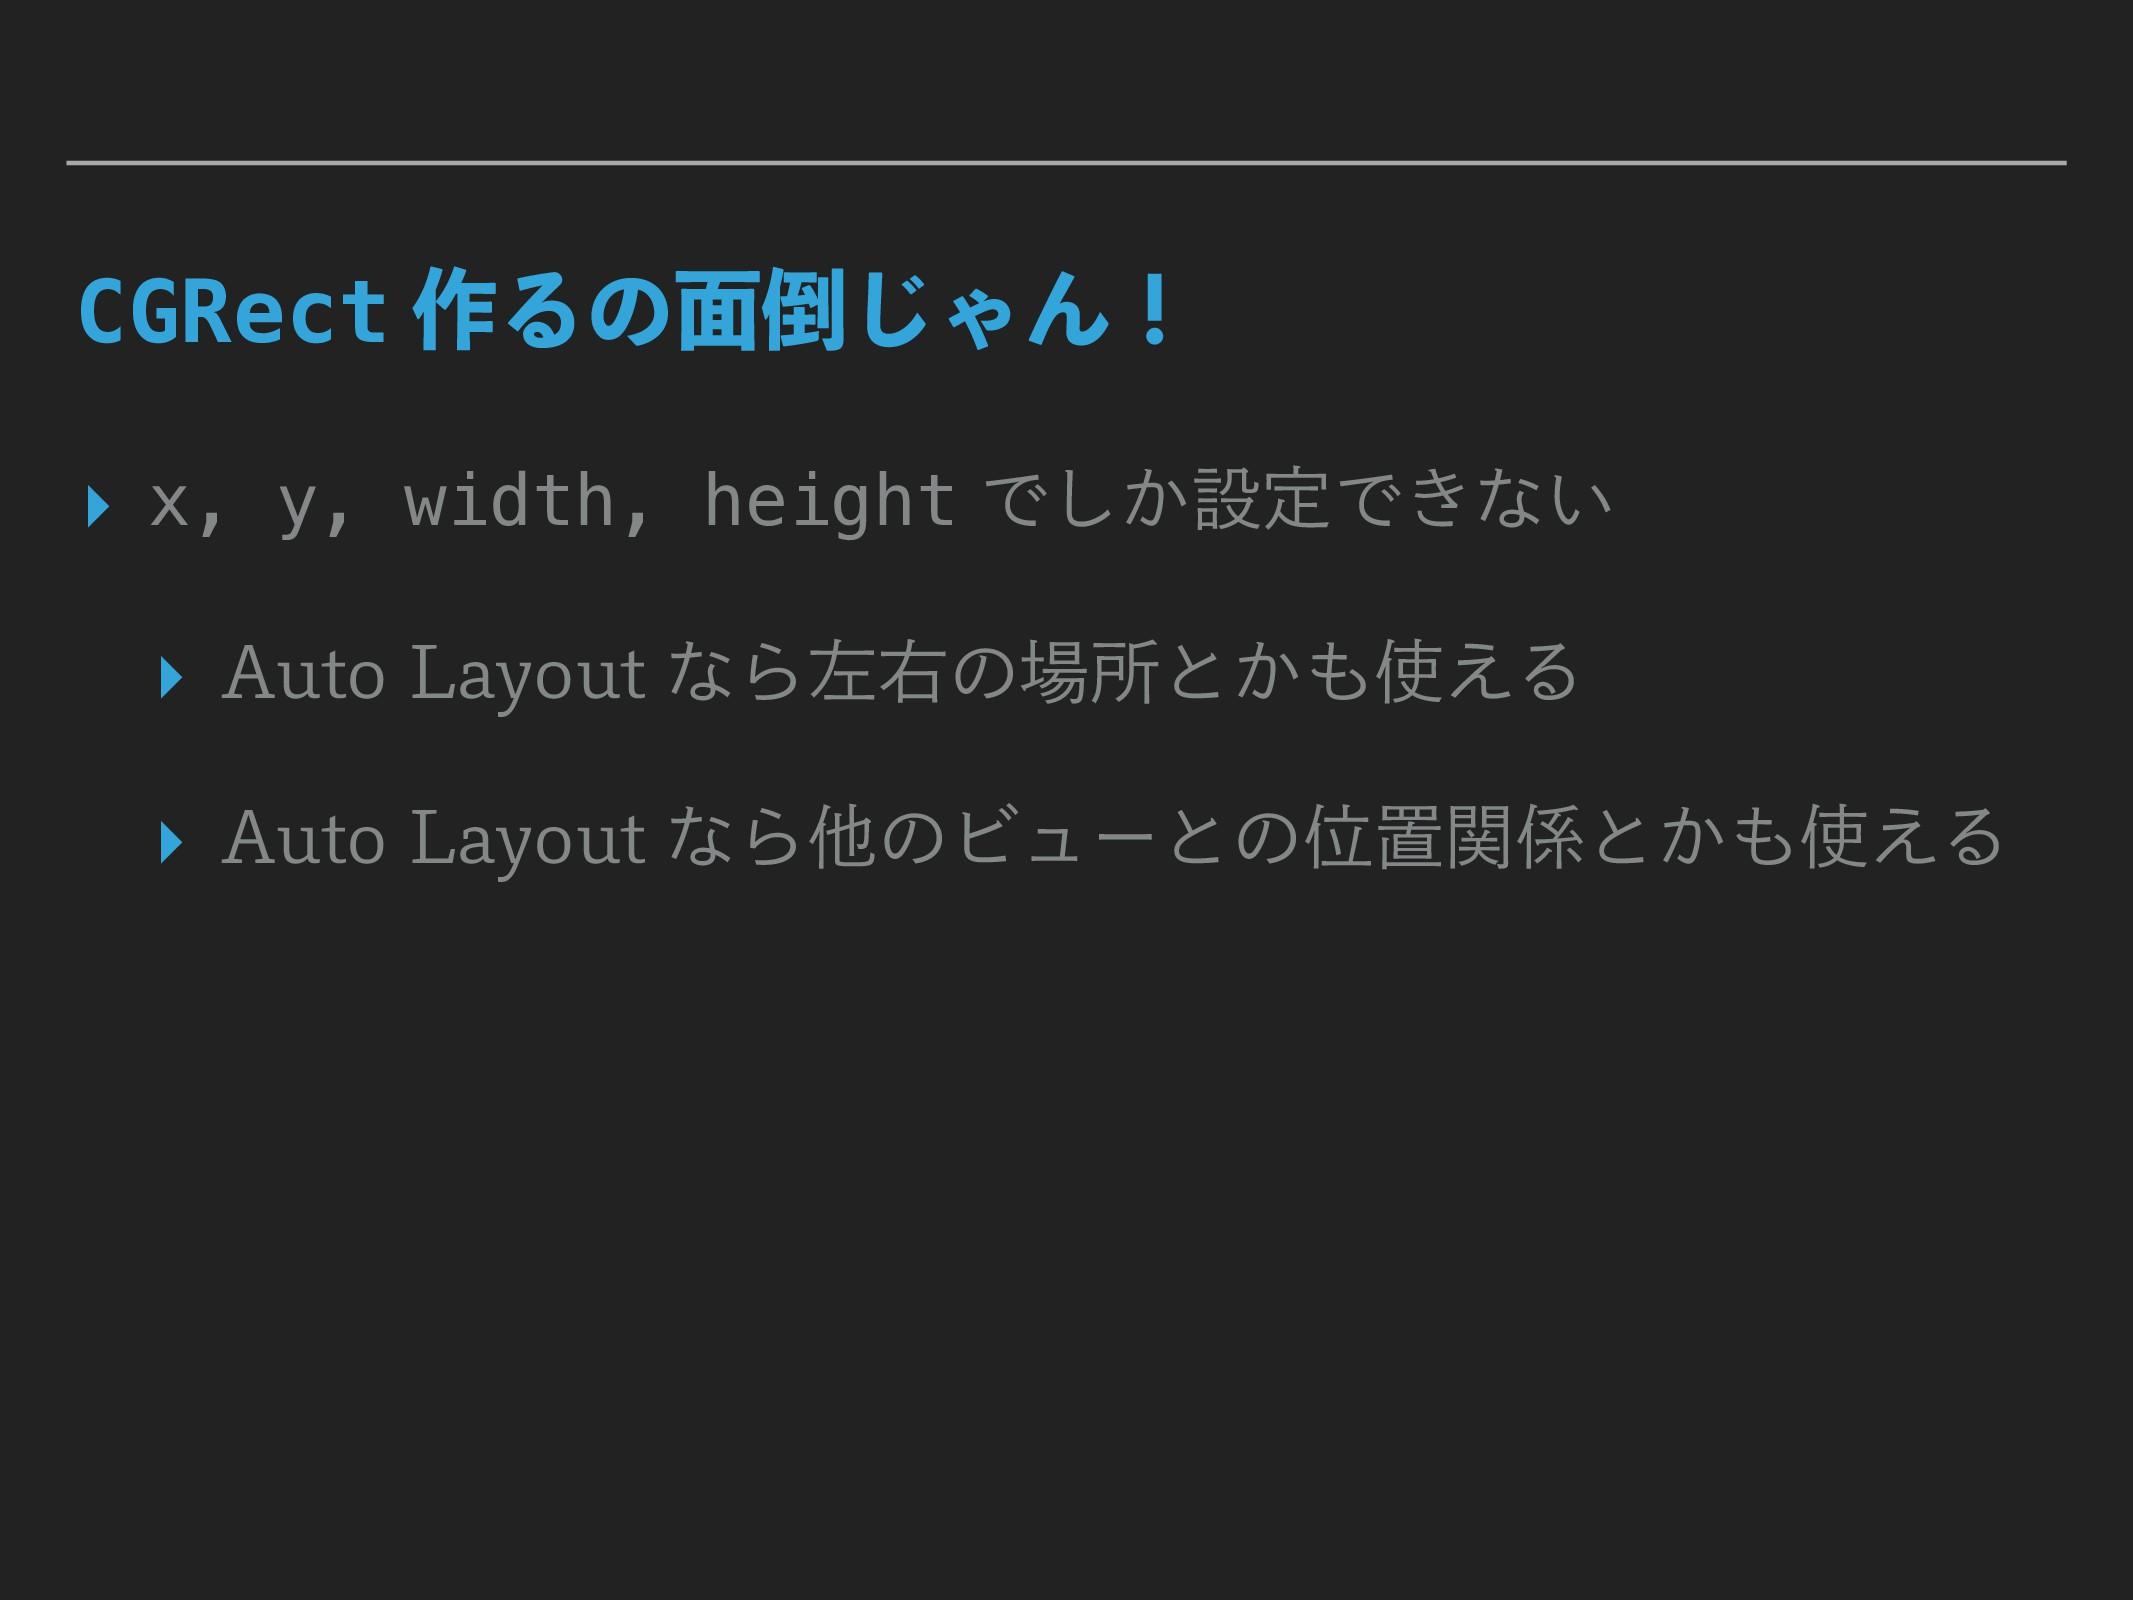 CGRect ࡞Δͷ໘͡ΌΜʂ ▸ x, y, width, height Ͱ͔͠ઃఆͰ͖ͳ...